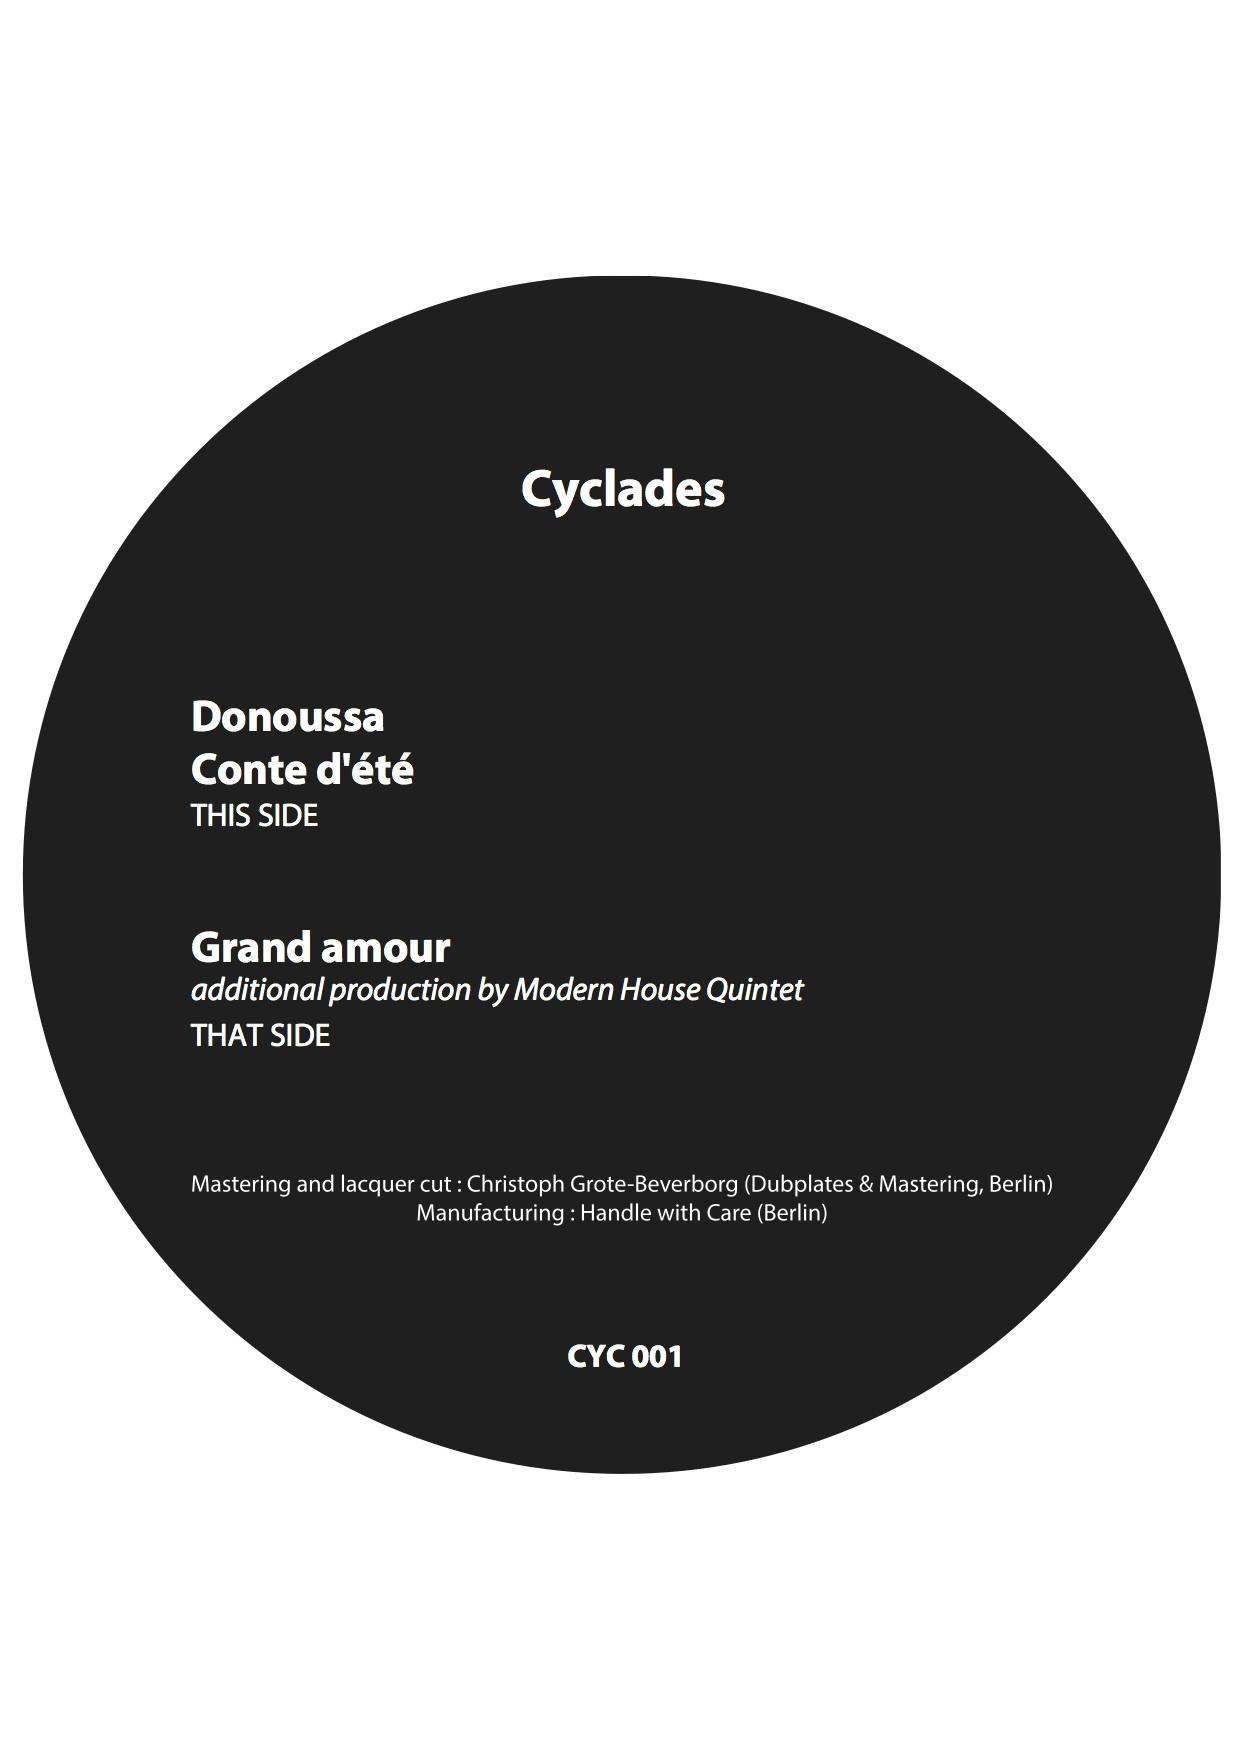 CYCLADES - DONUSSA